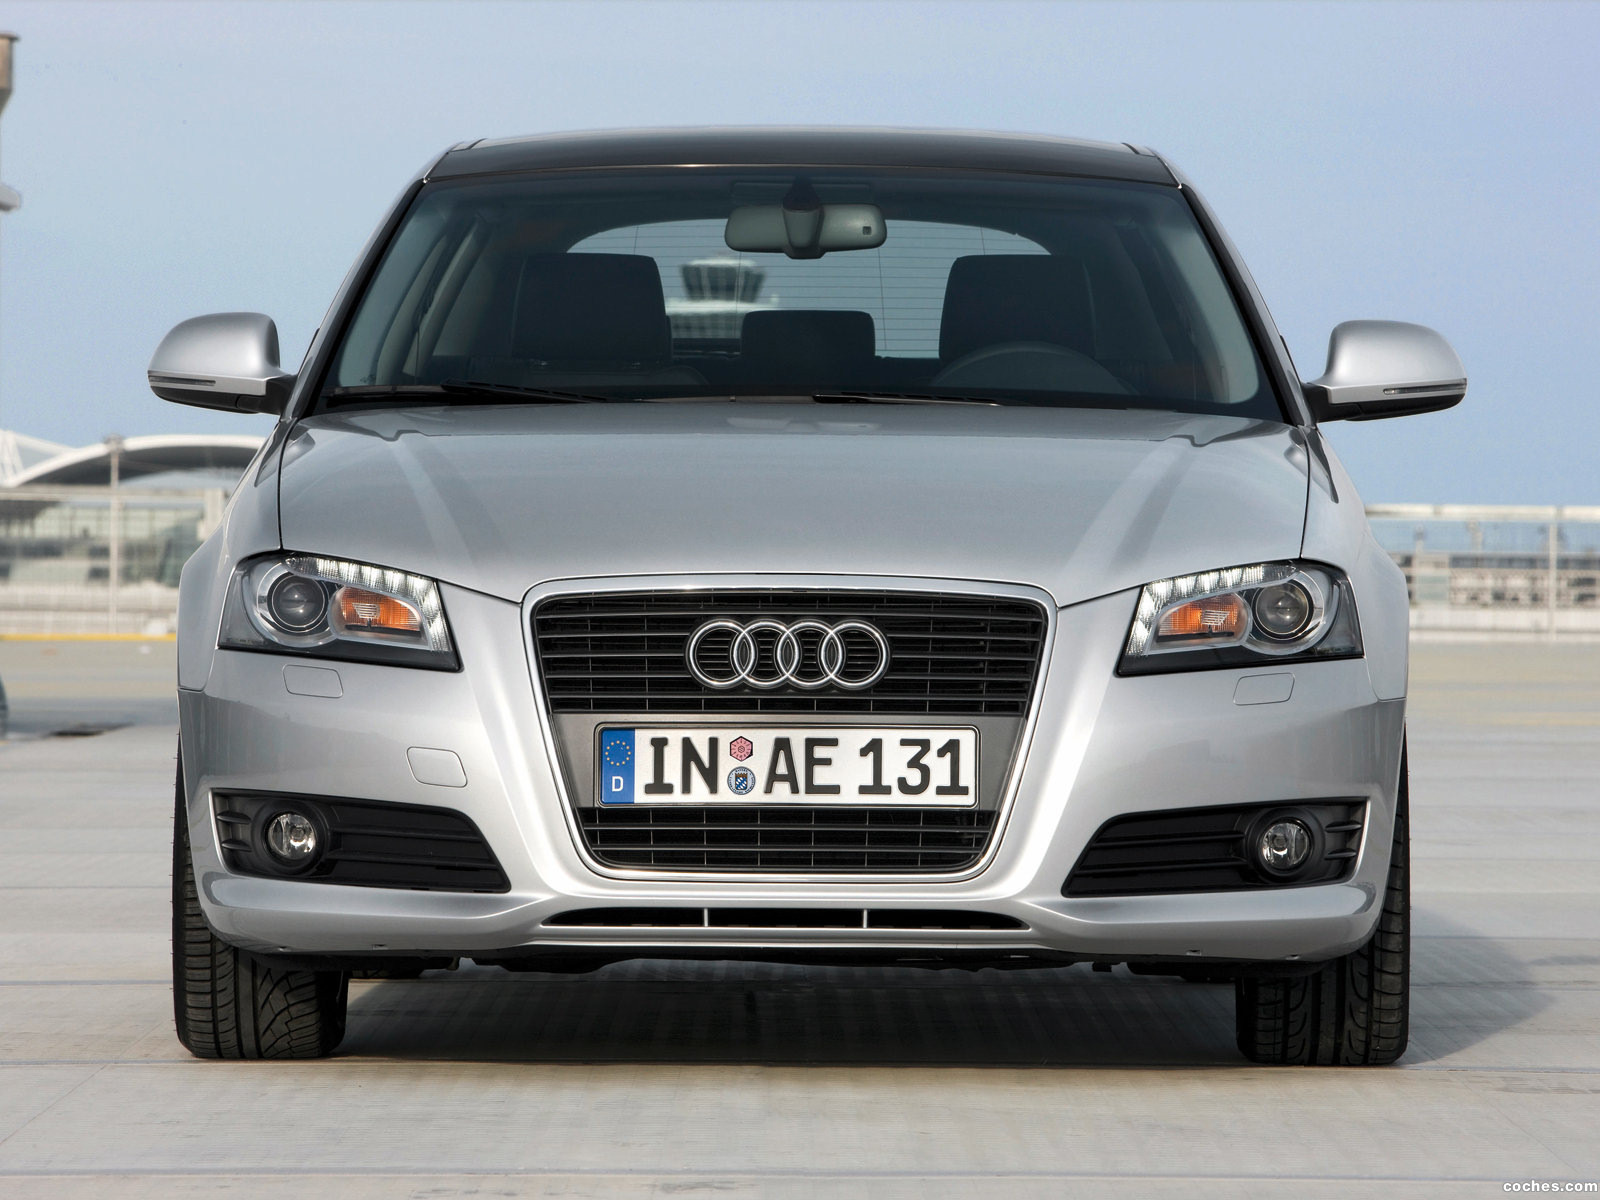 Foto 1 de Audi A3 Sportback Facelift 2008